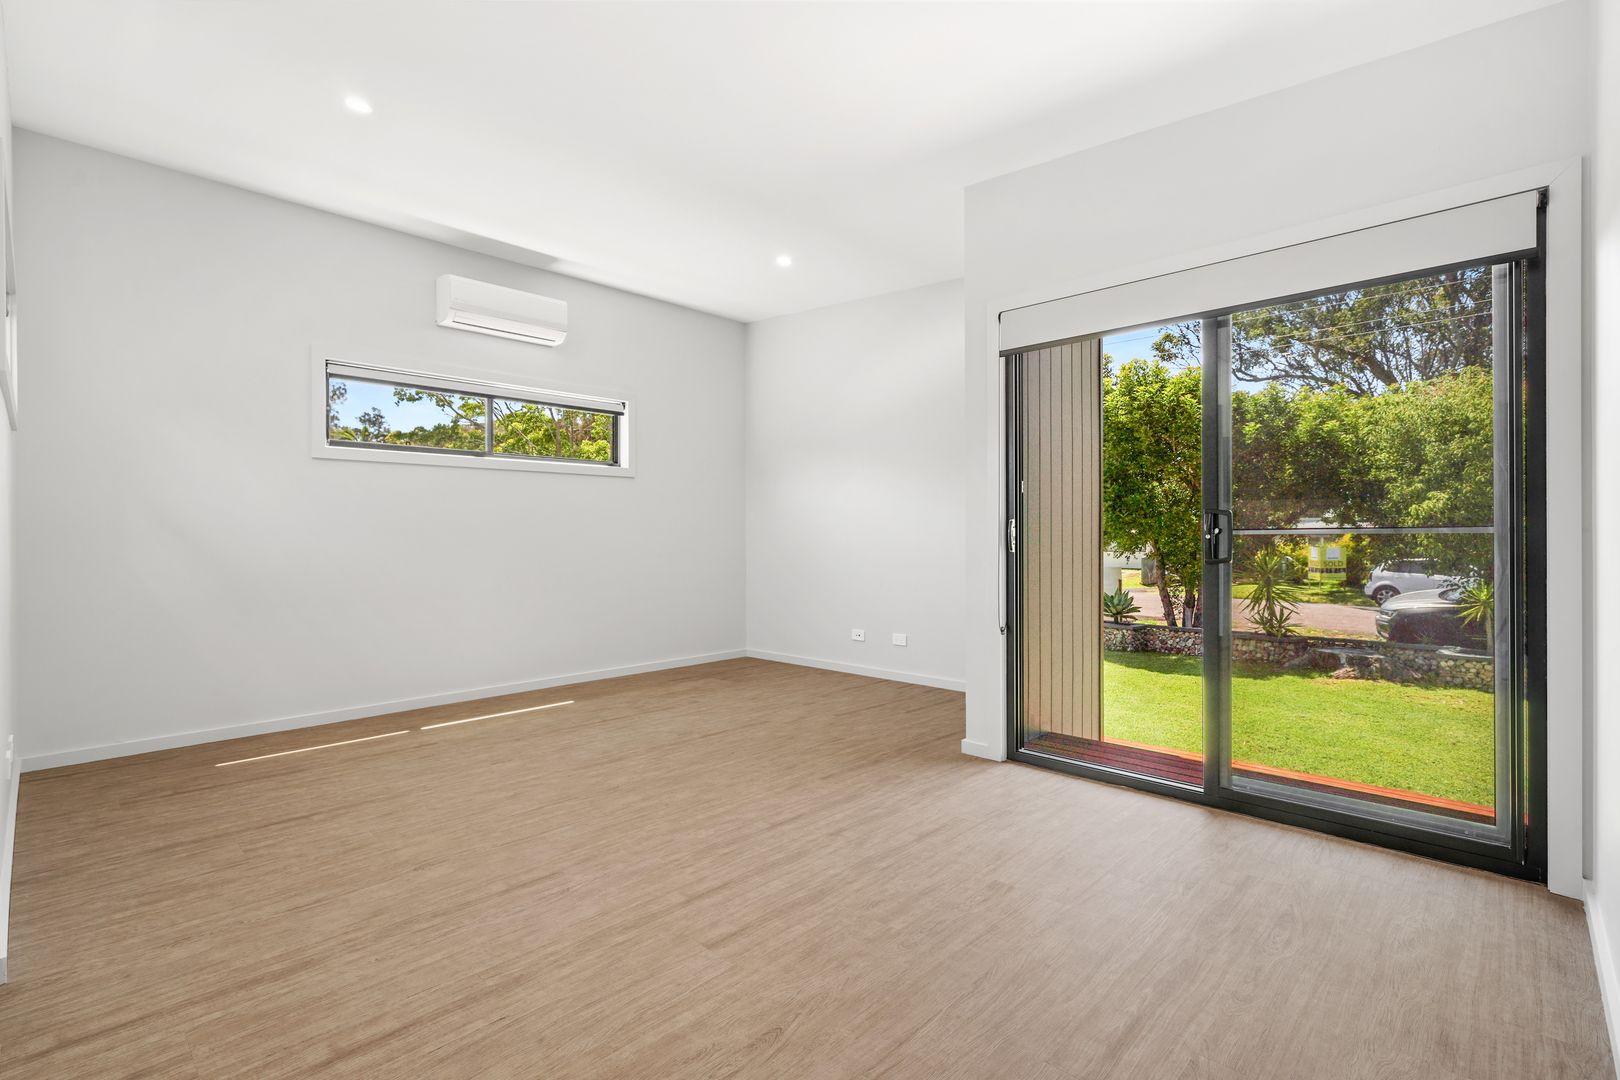 19a Mundoora Ave, Yattalunga NSW 2251, Image 2